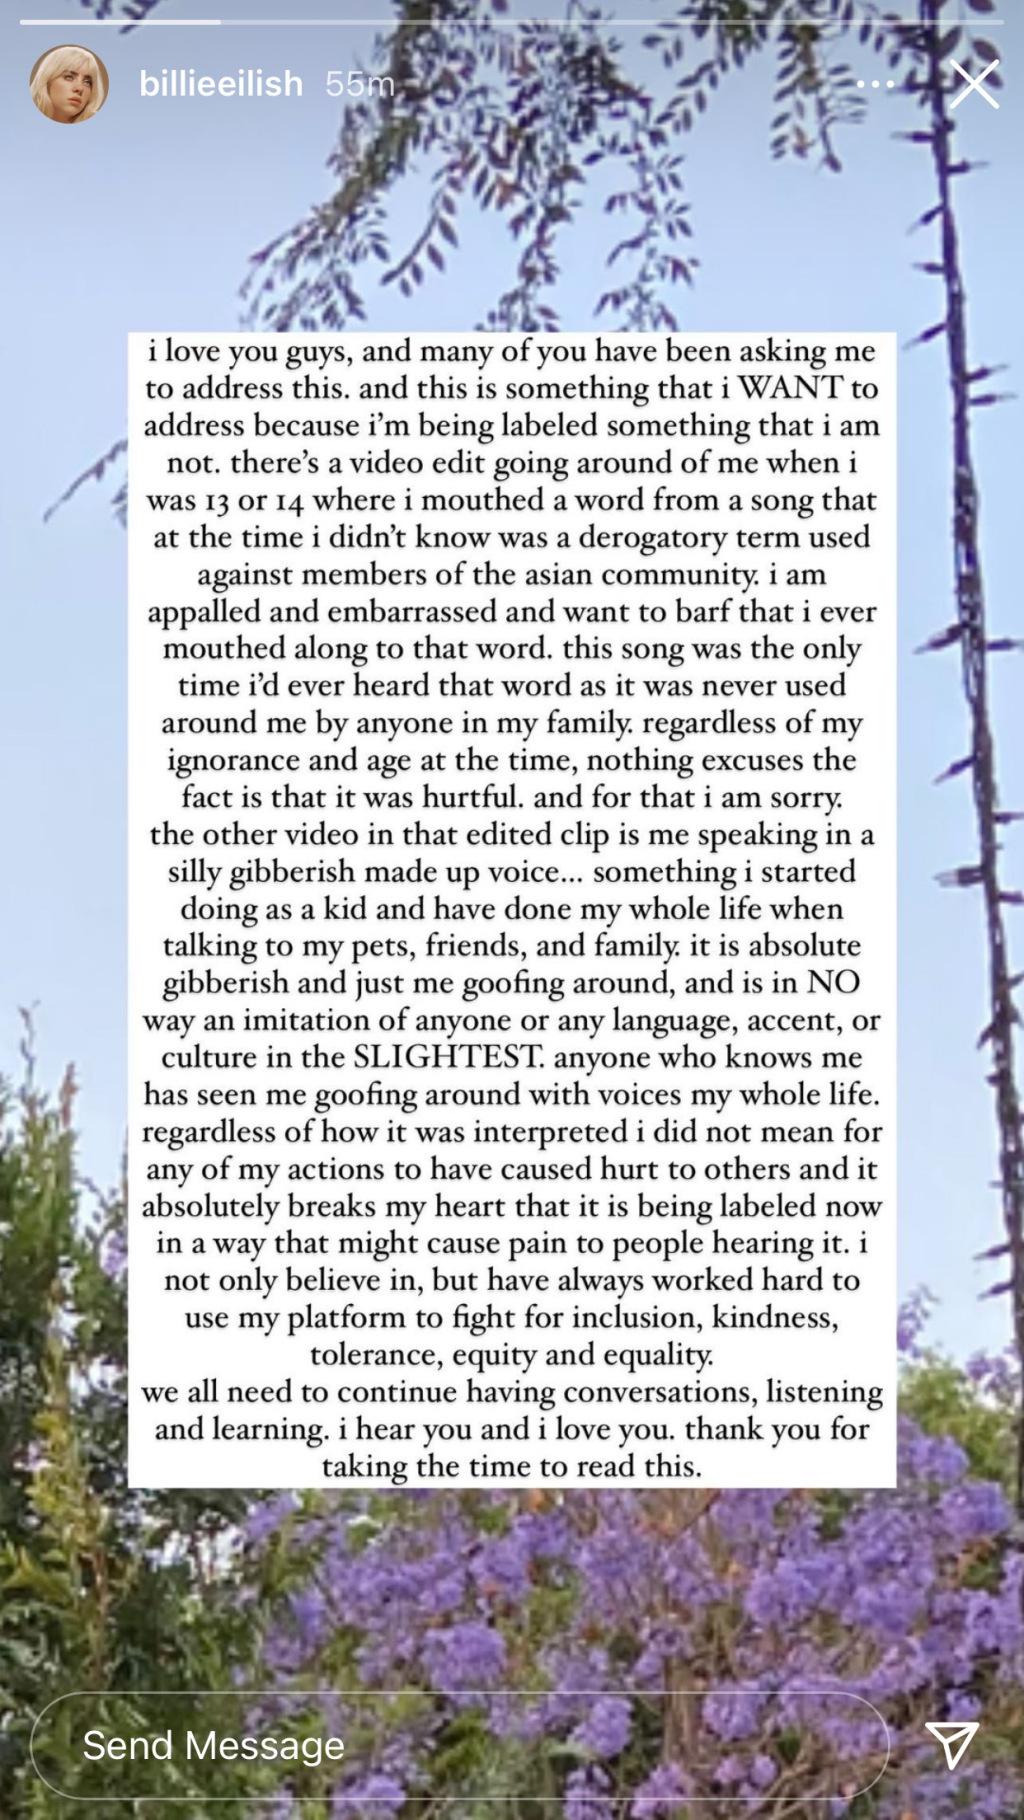 Câu chuyện trên Instagram của Billie Eilish